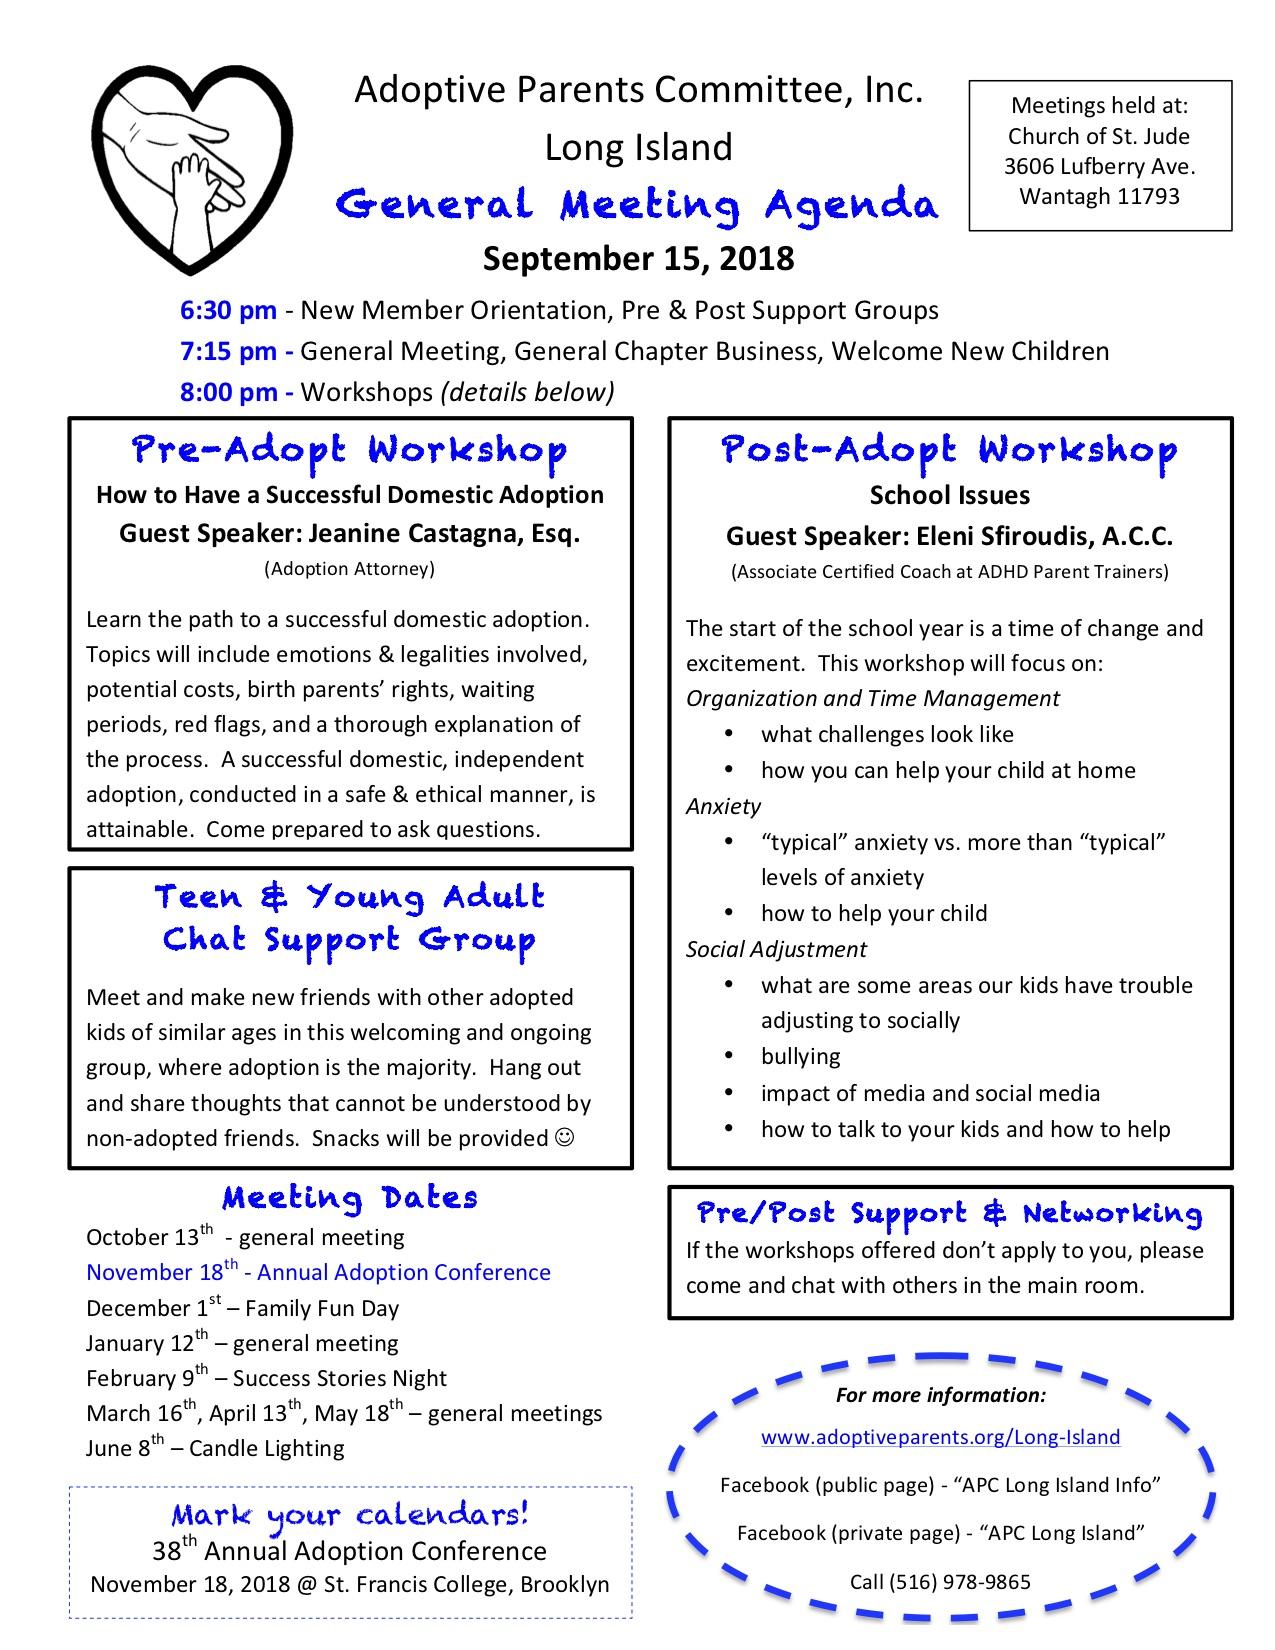 September 15 - Long Island General Meeting — Adoptive